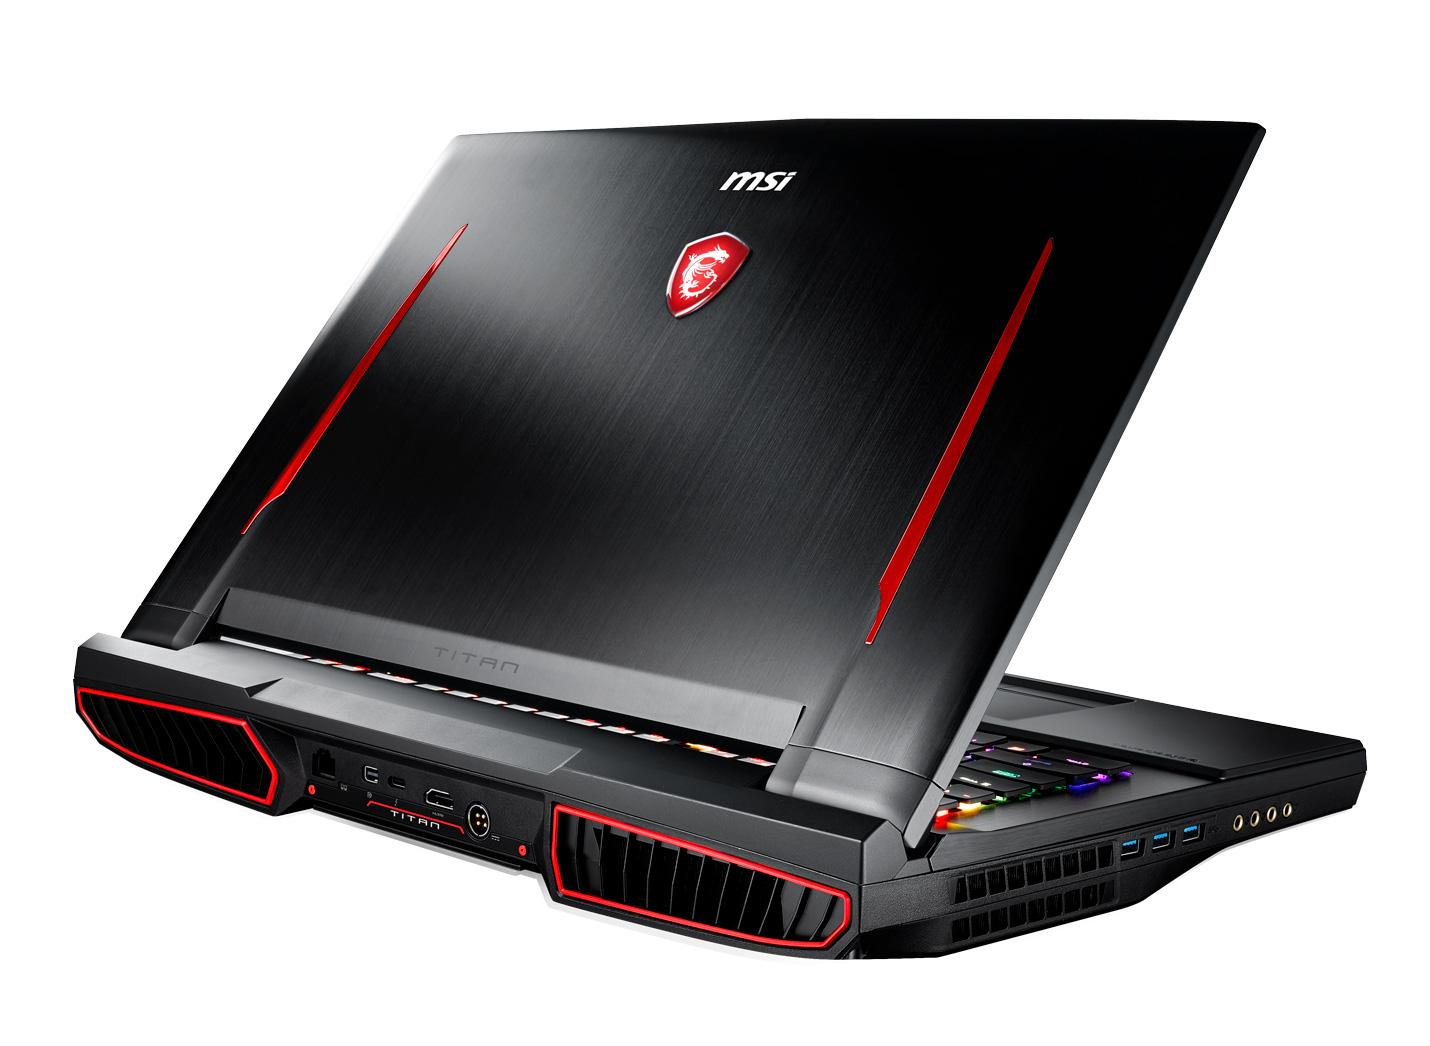 Image du PC portable MSI GT75 8RF-091FR Titan - SLI GTX 1070, 4K IPS, i9